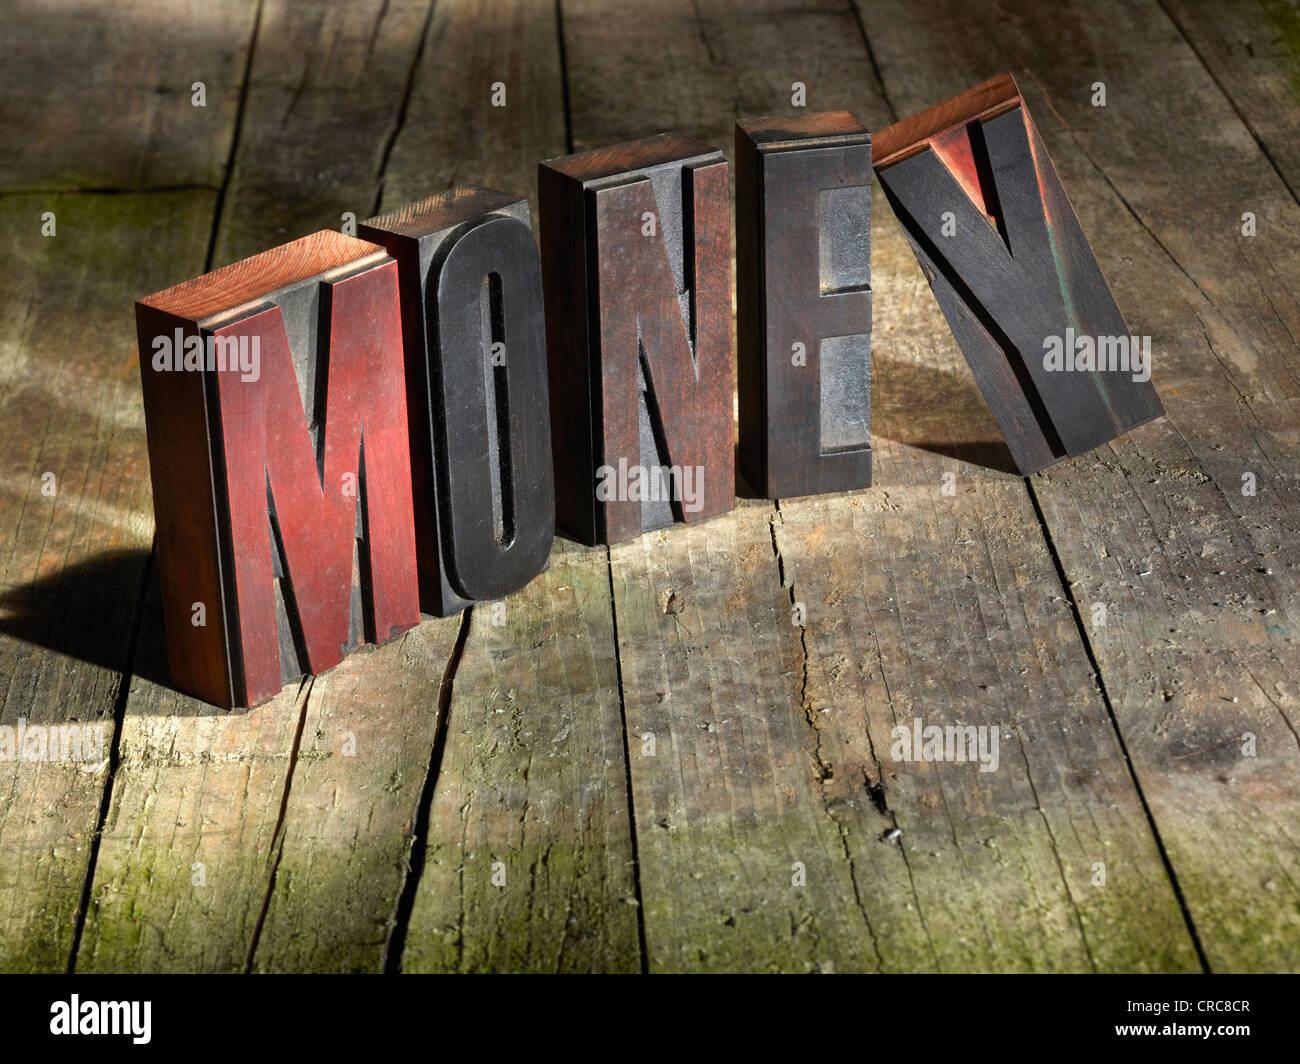 Wooden blocks spelling money - Stock Image